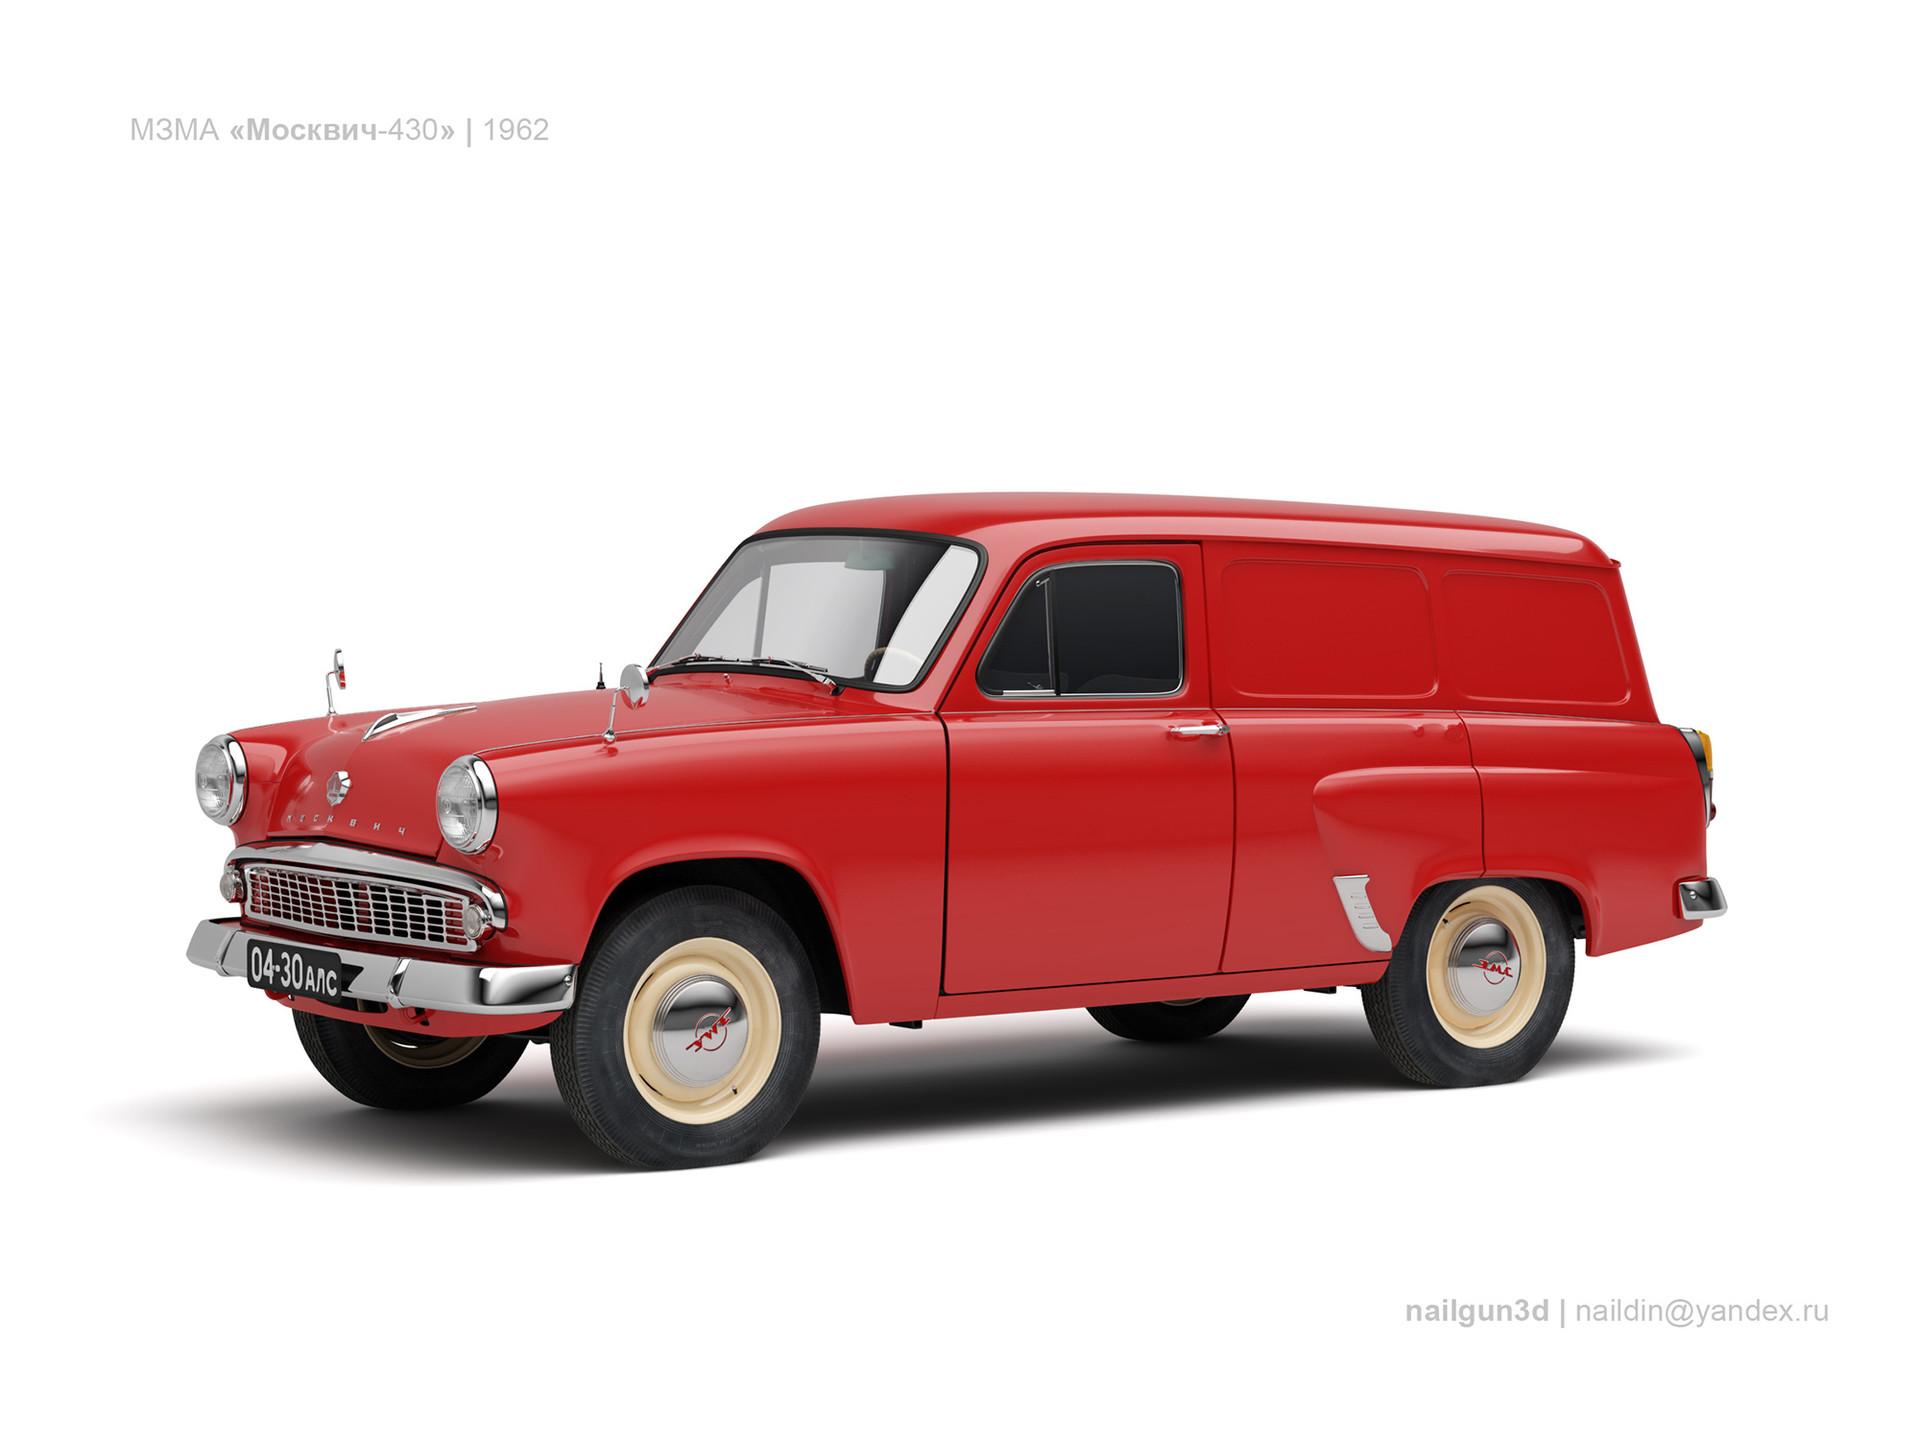 Nail khusnutdinov ussr moskvich 430 1962 0